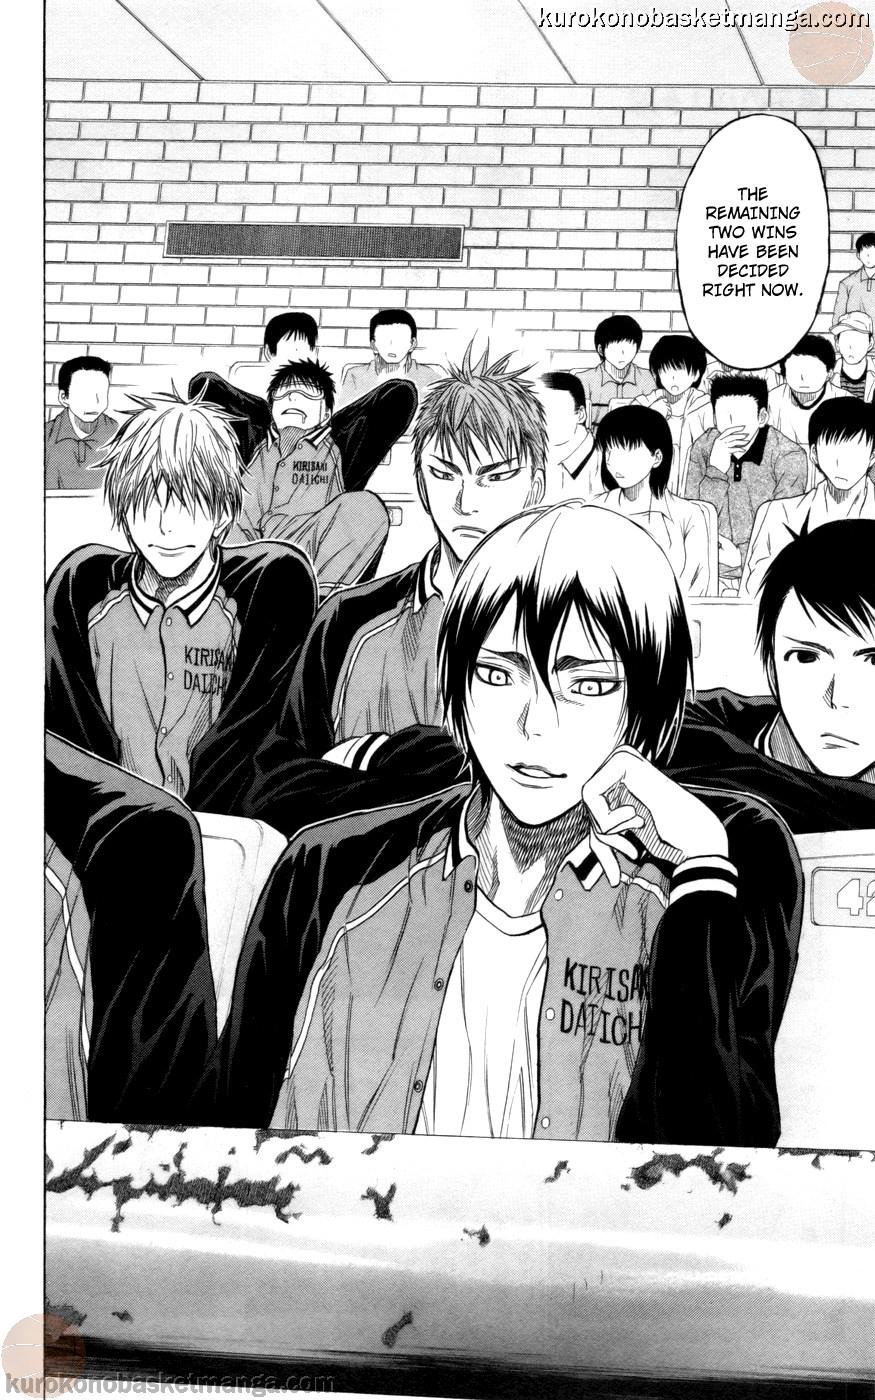 Kuroko no Basket Manga Chapter 84 - Image 18